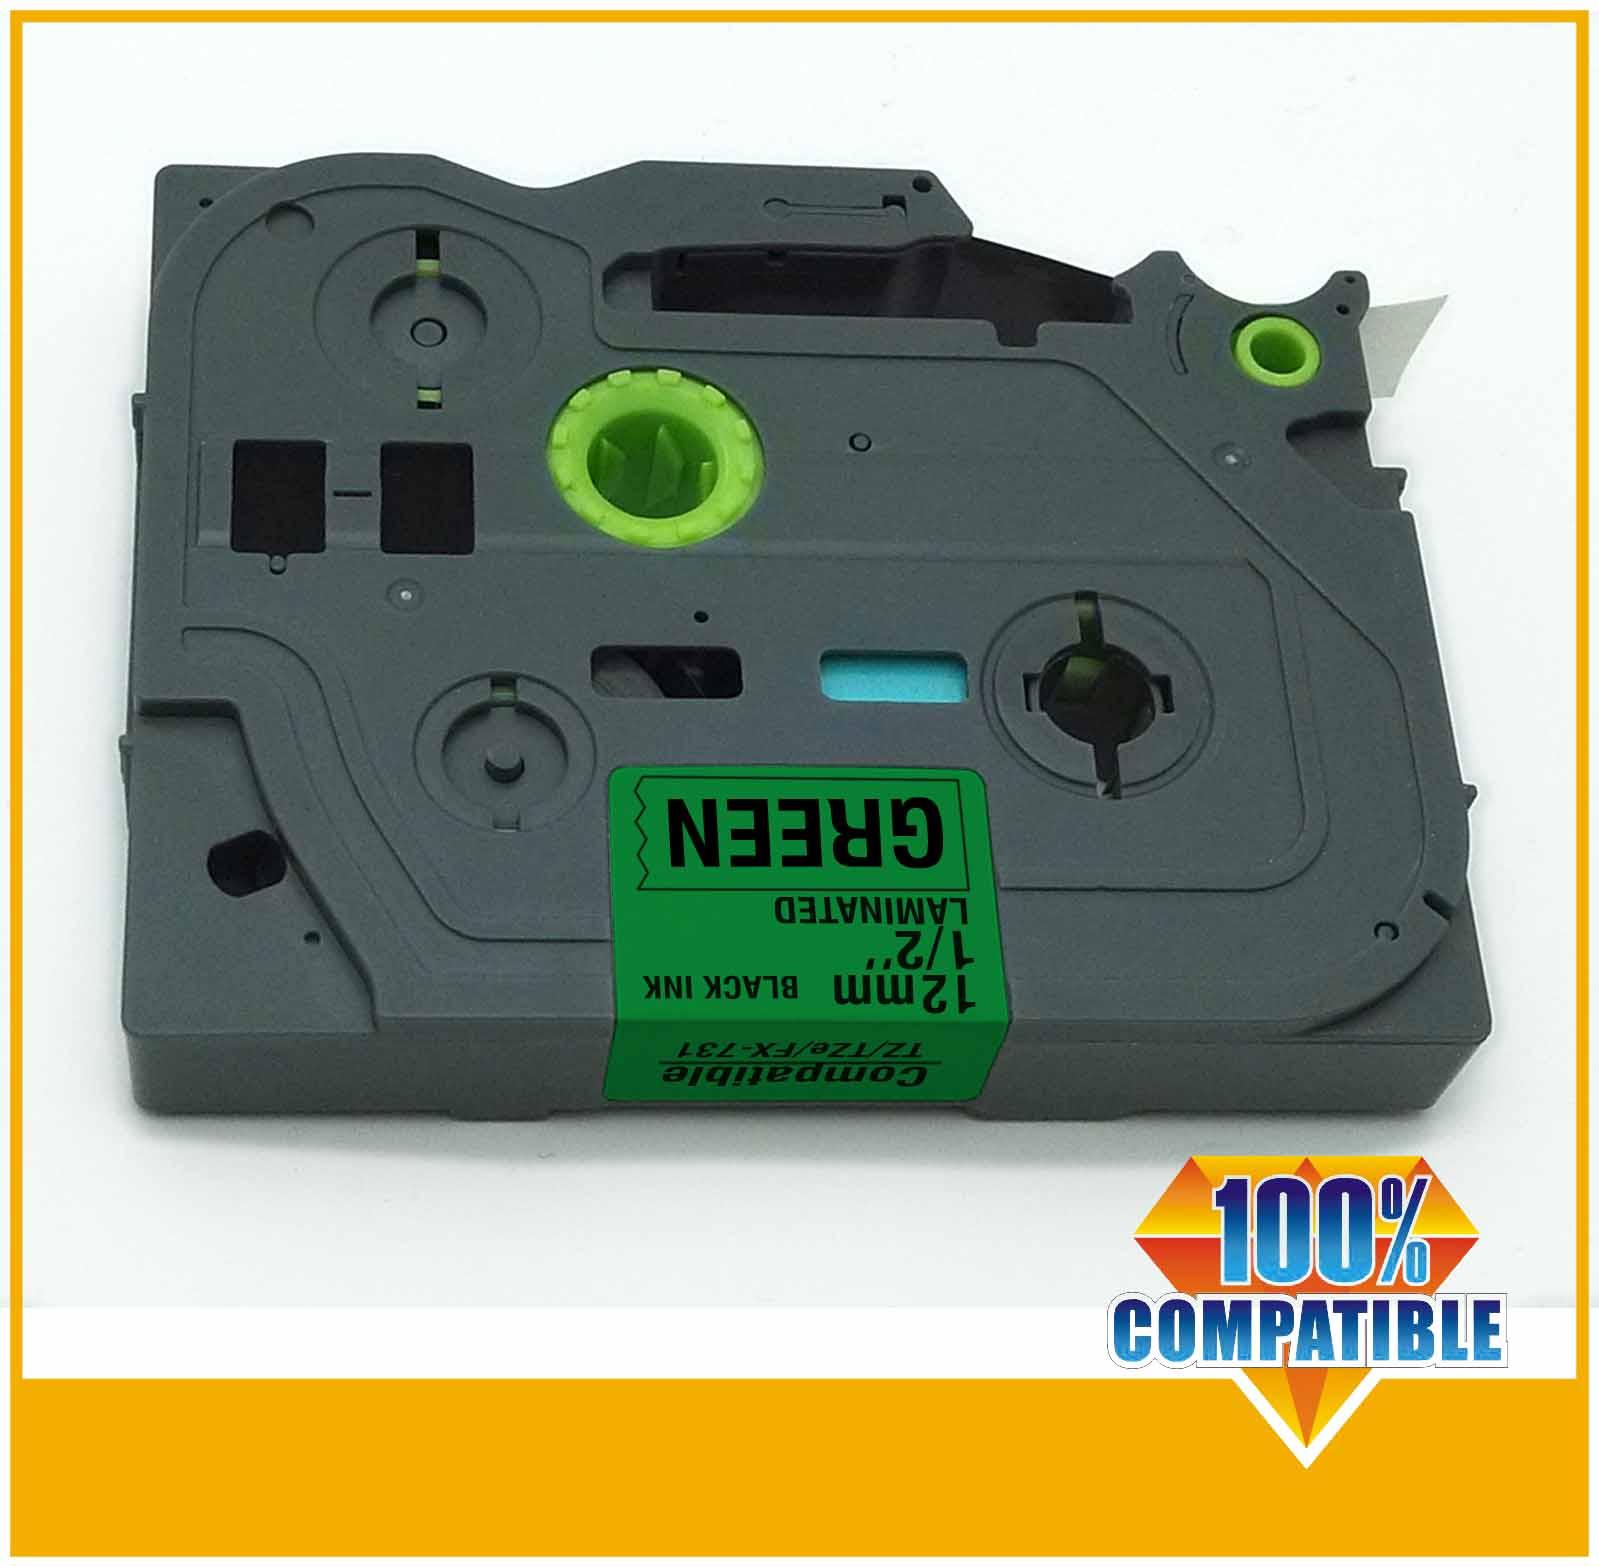 New 2014 p touch tape tz-731, tz731,black on gree tape 12mm TZ 731 compatible TZ tape